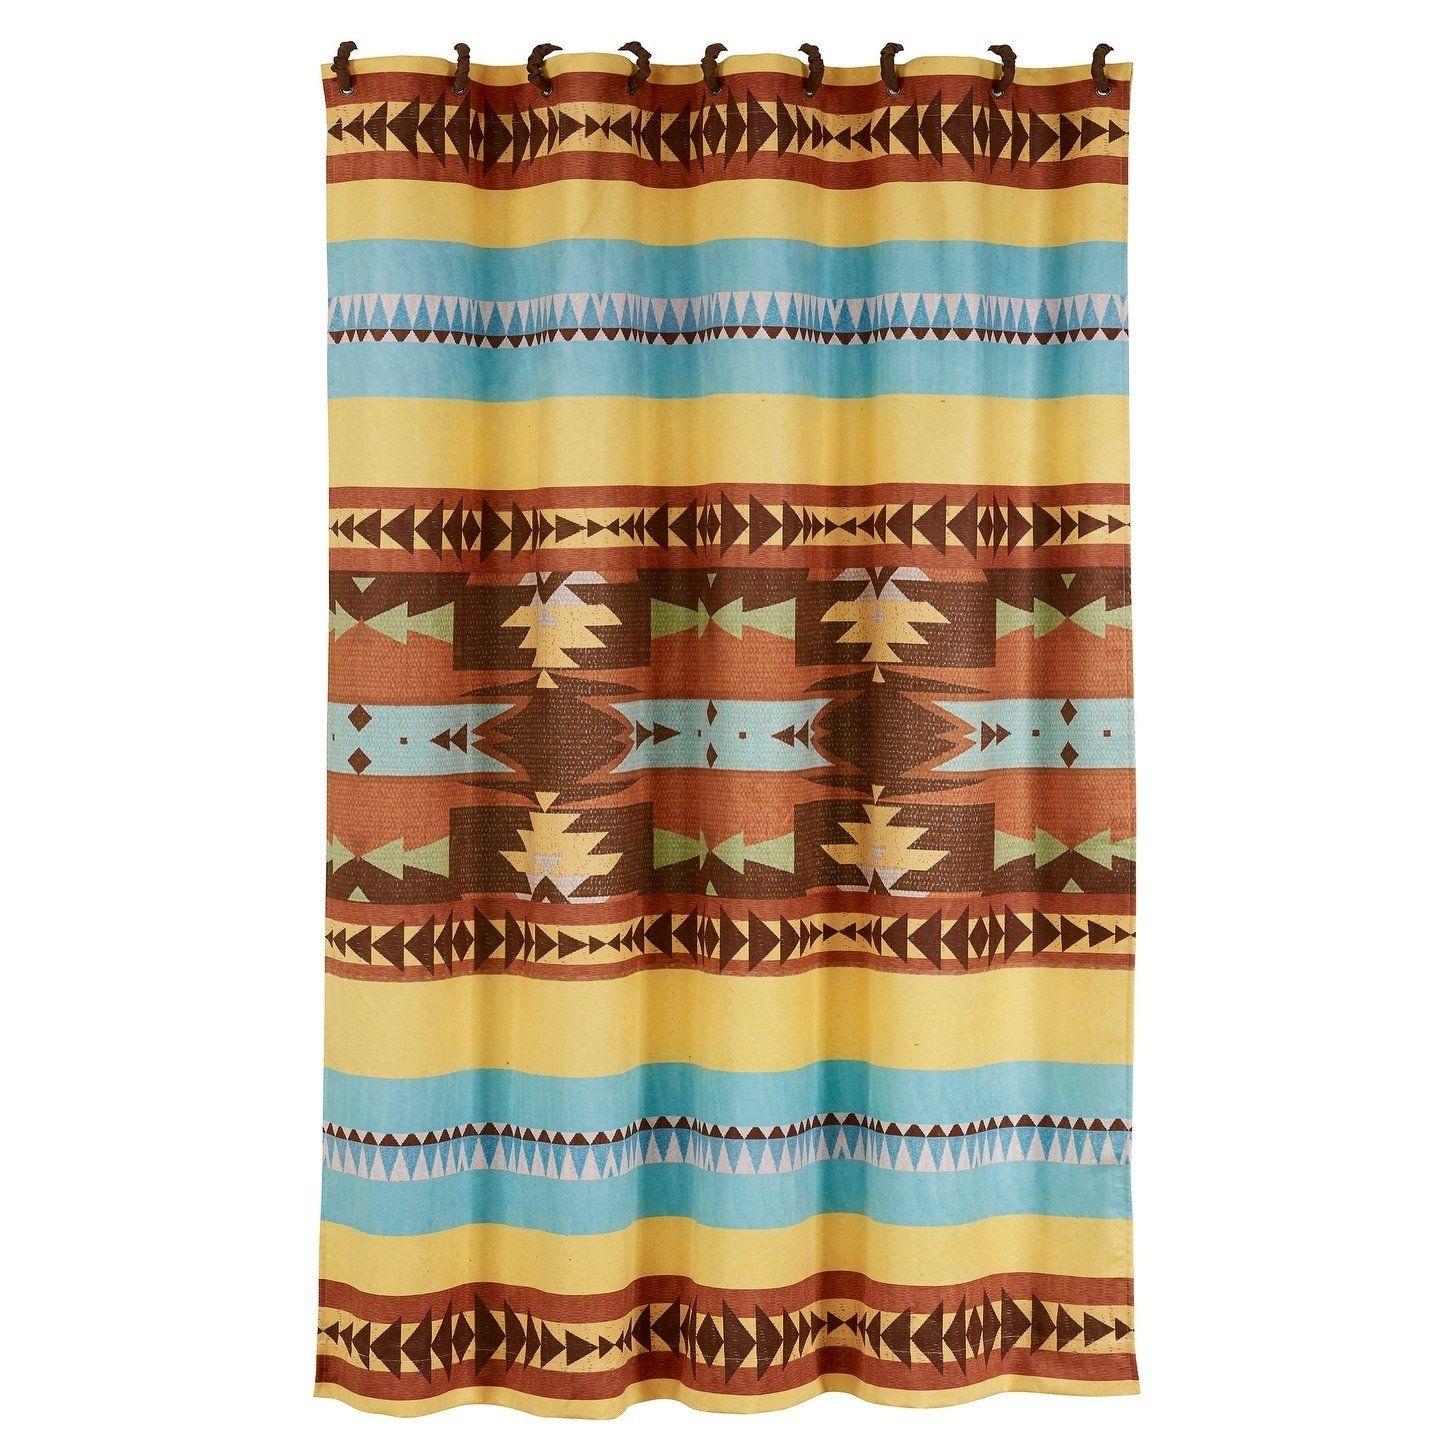 Hiend Accents Meza Southwest Shower Curtain 72x72 Brown 72 X